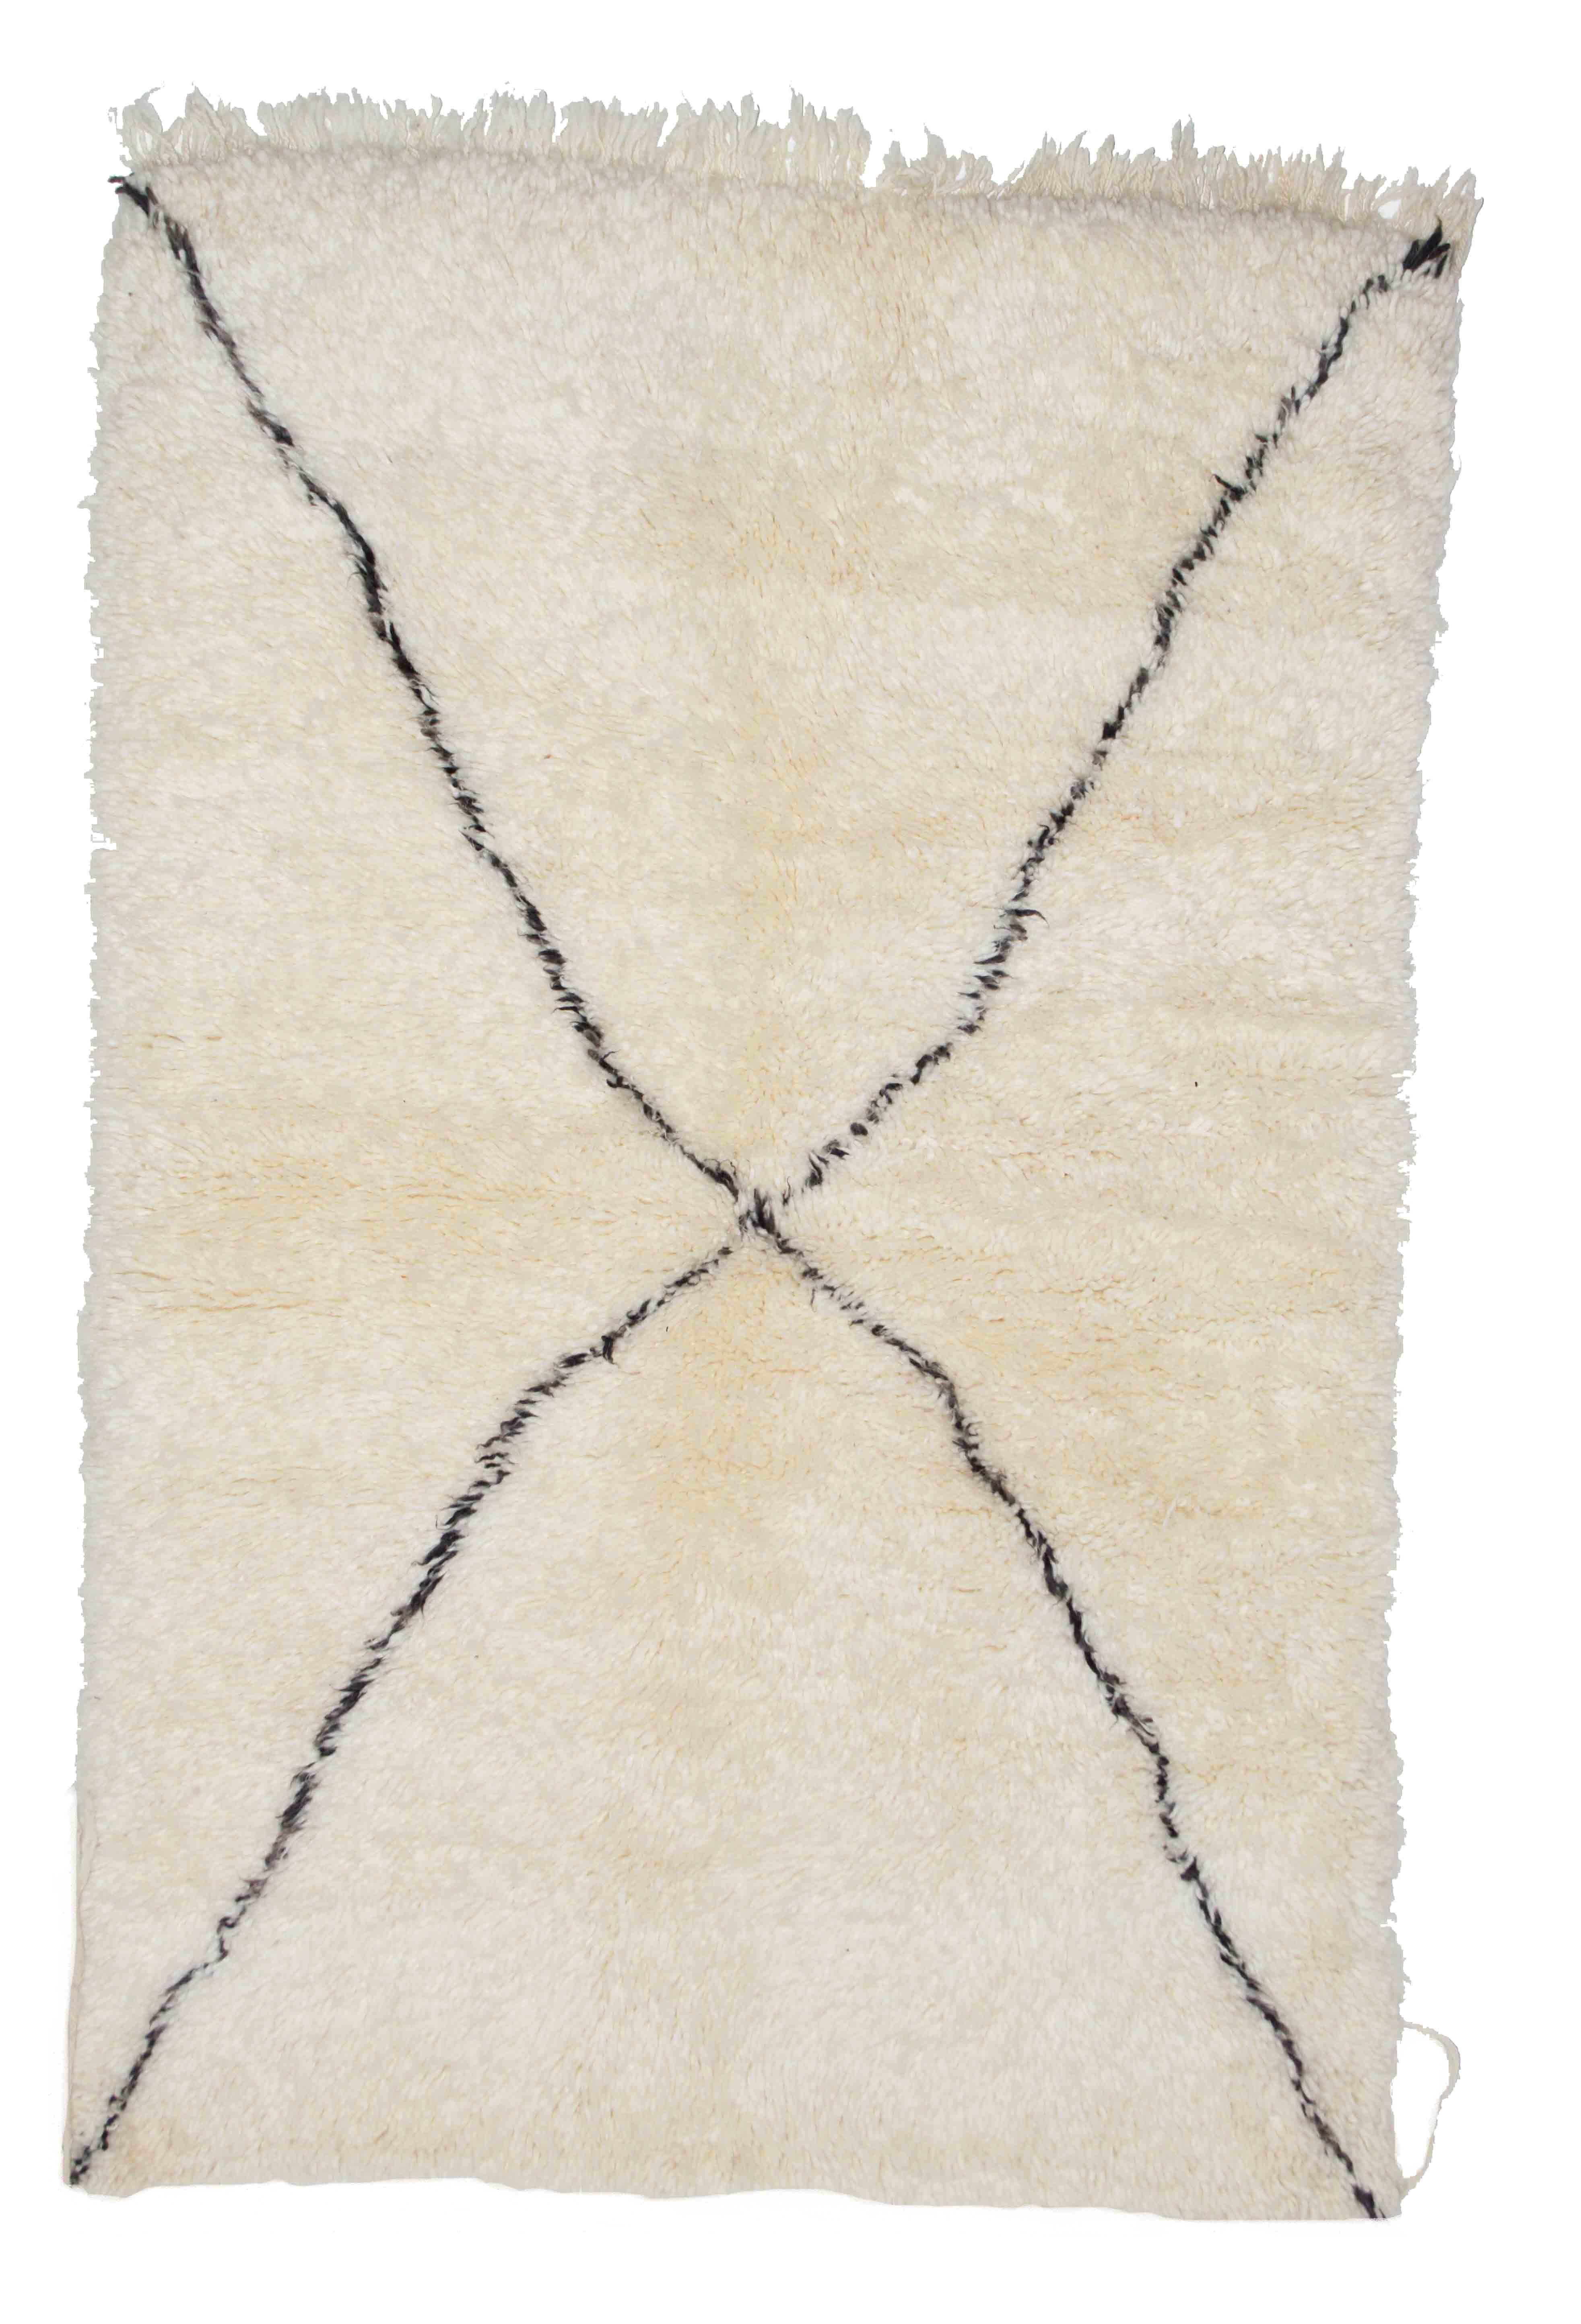 Beni Ourain BN12 - 170 x 112 cm